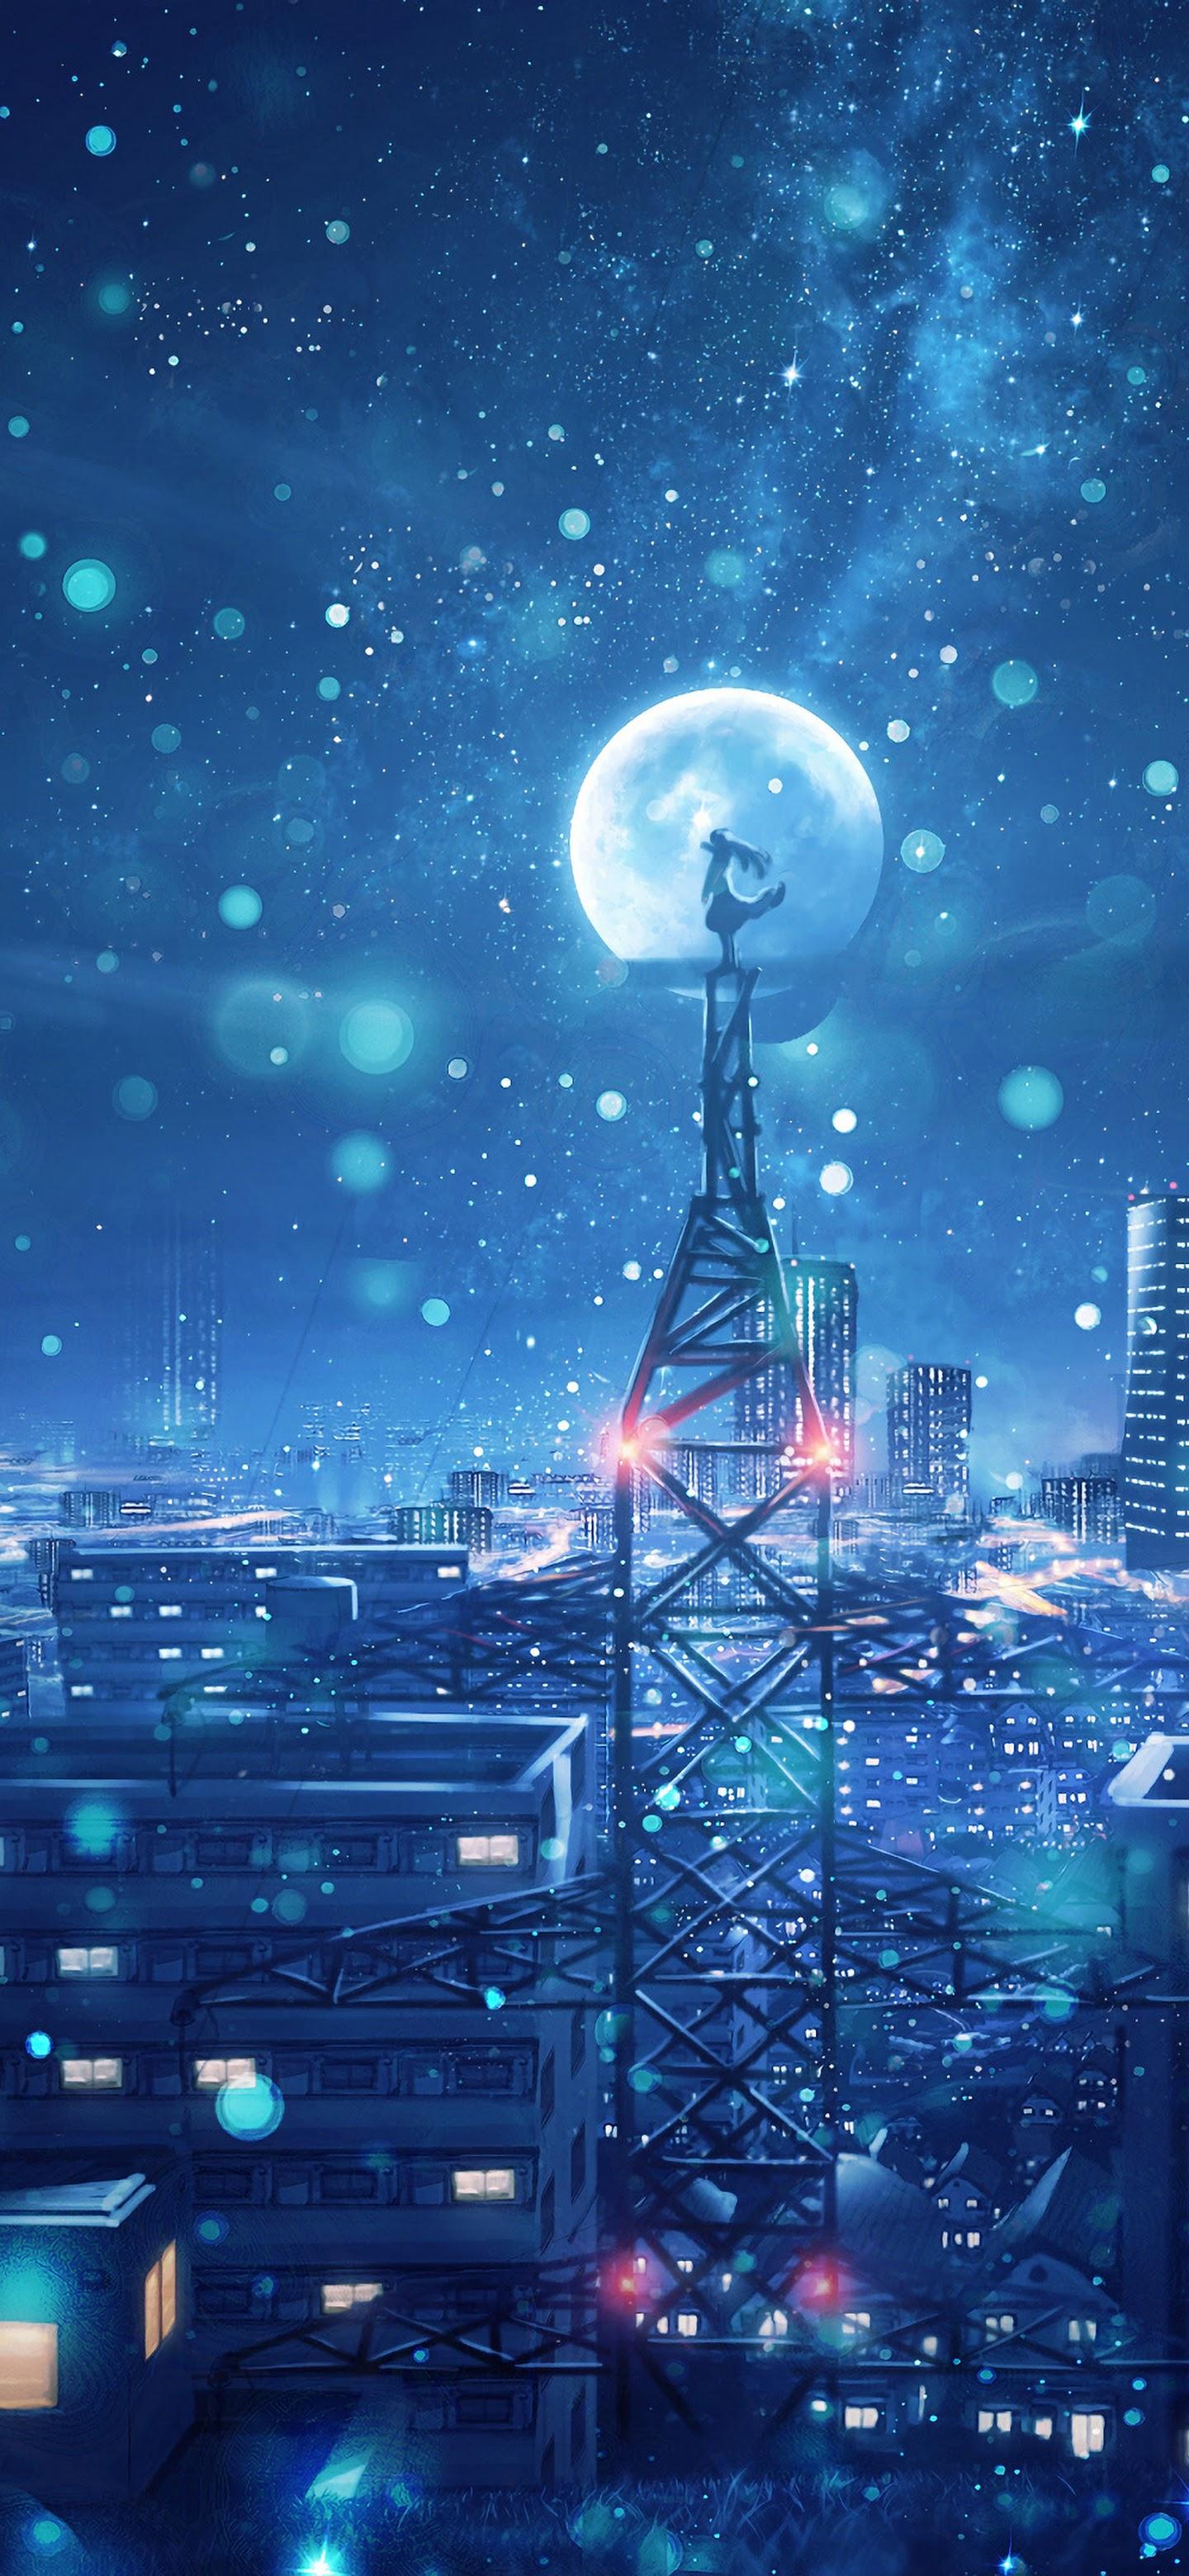 Night Sky City Stars Anime Scenery 4K Wallpaper 135 1440x3120